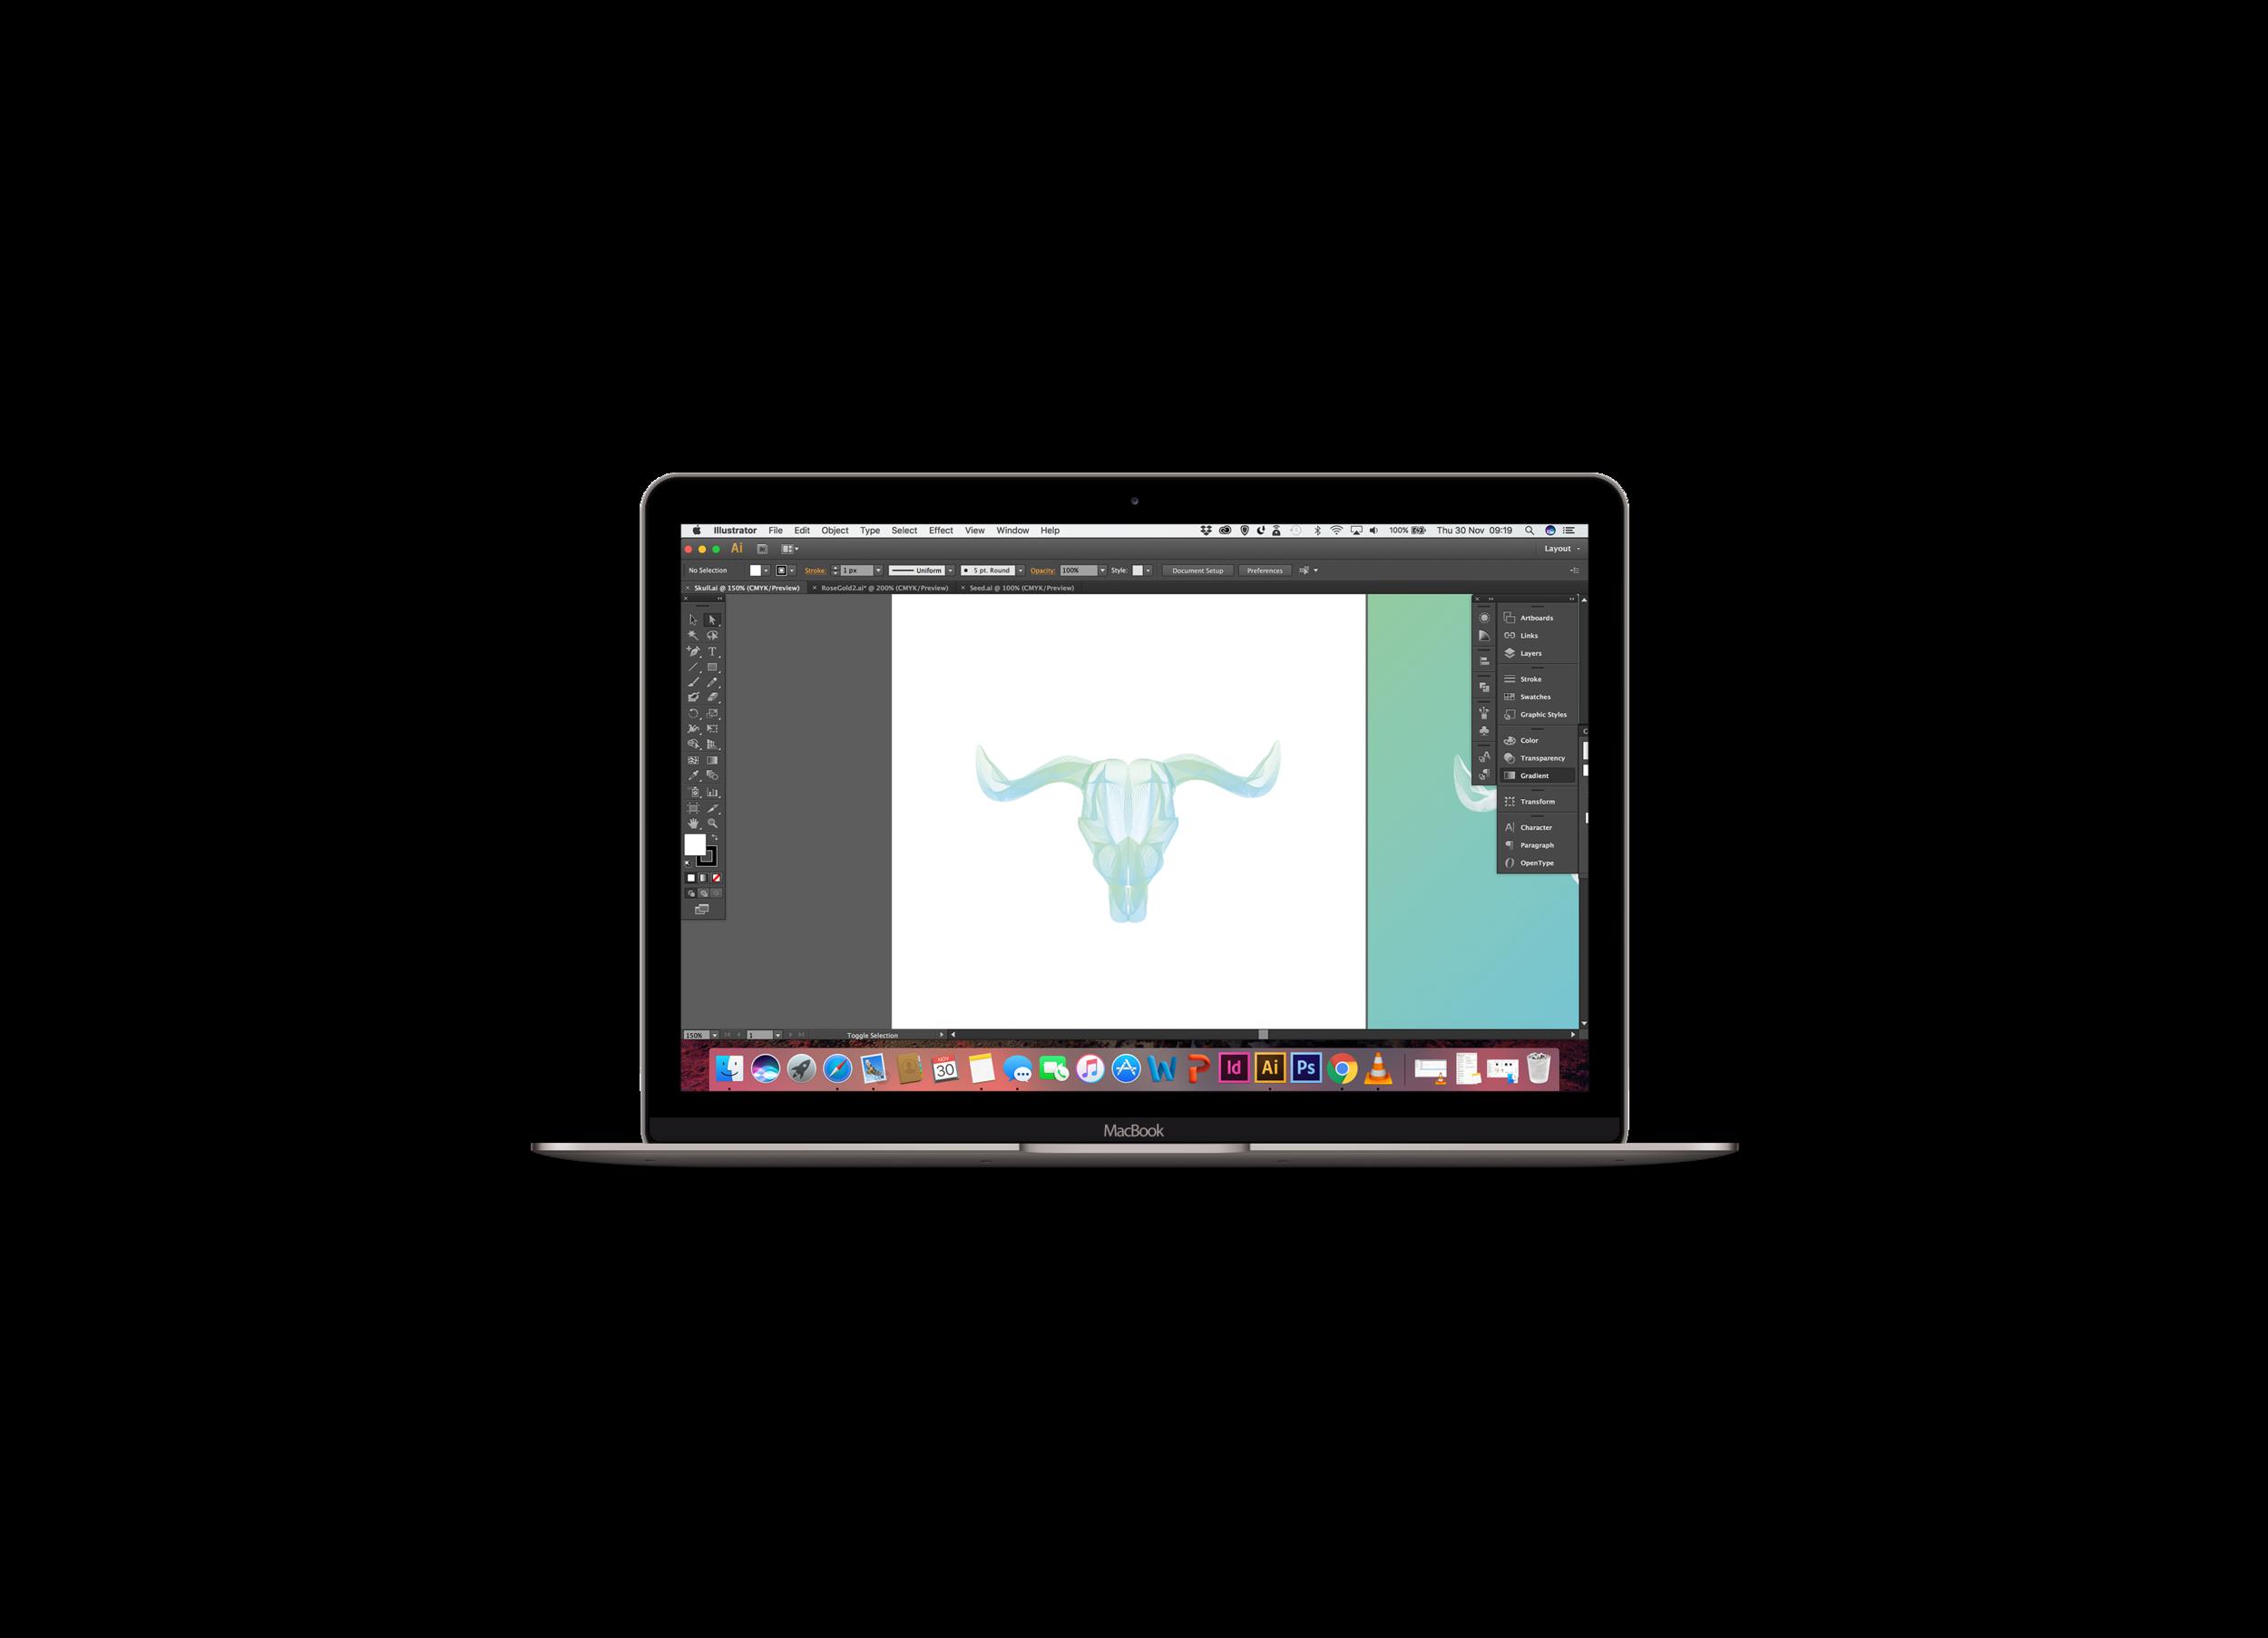 003-MacBook-Space-Gray.png